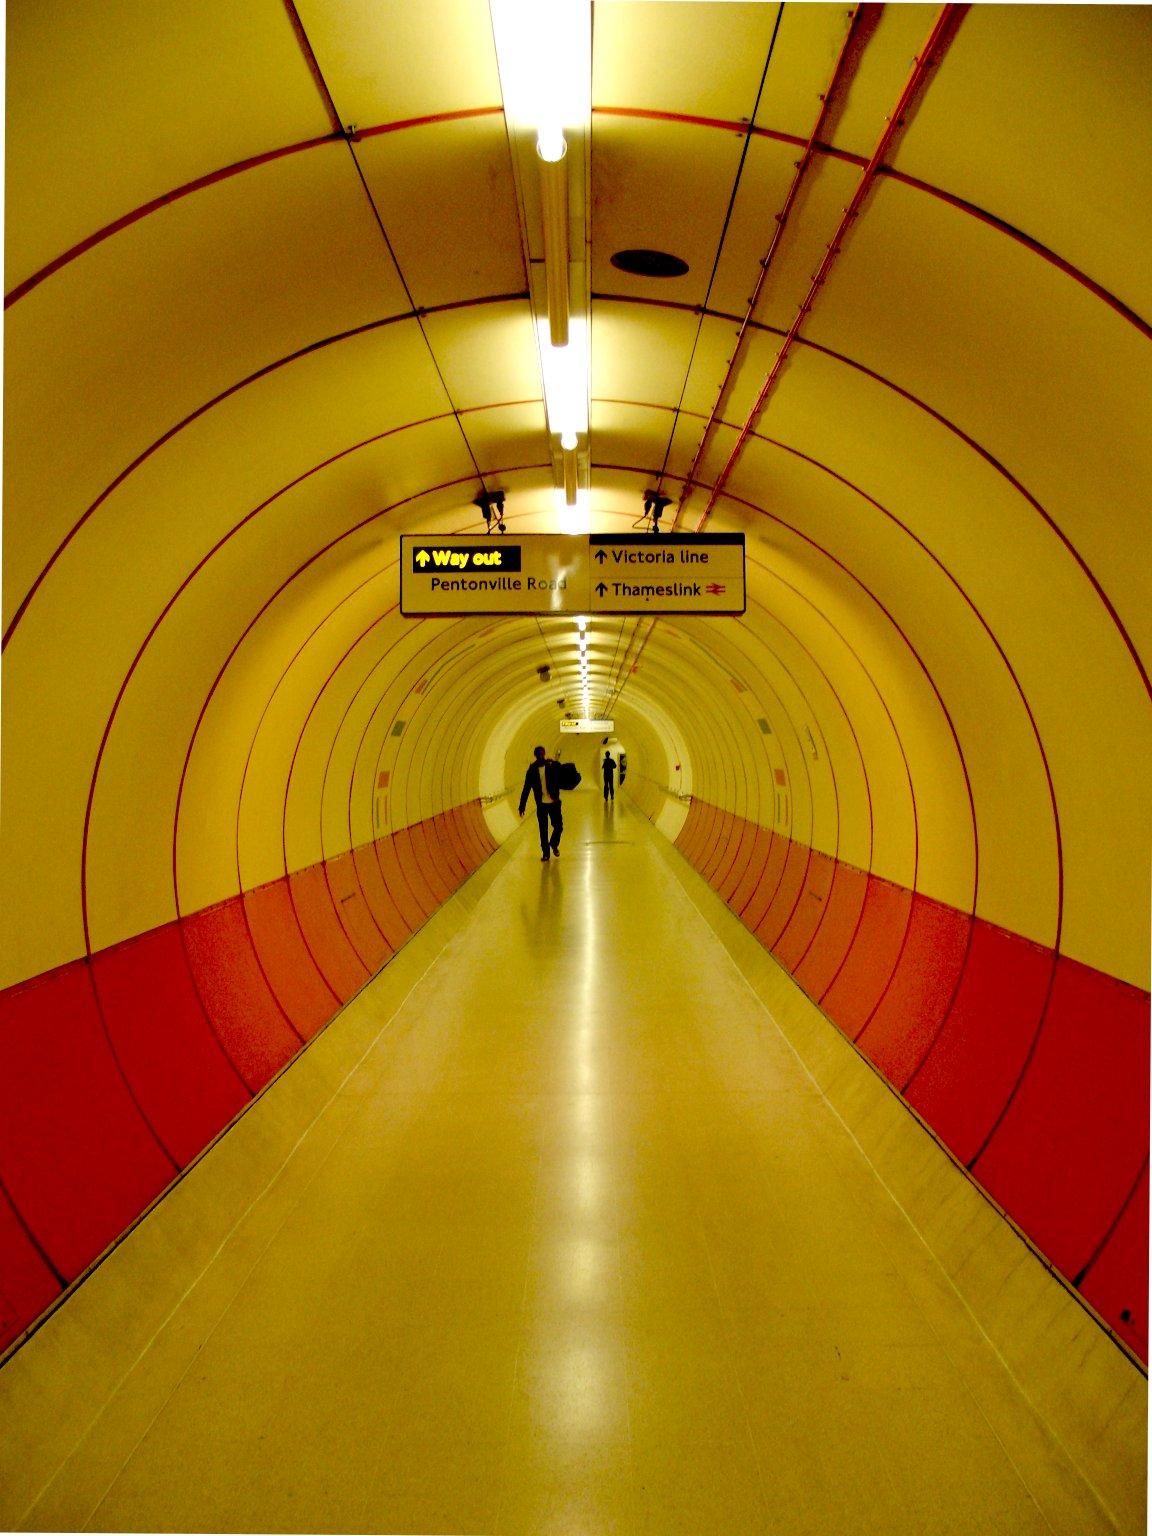 Man Cave Kings Cross : File kings cross tunnel g wikimedia commons